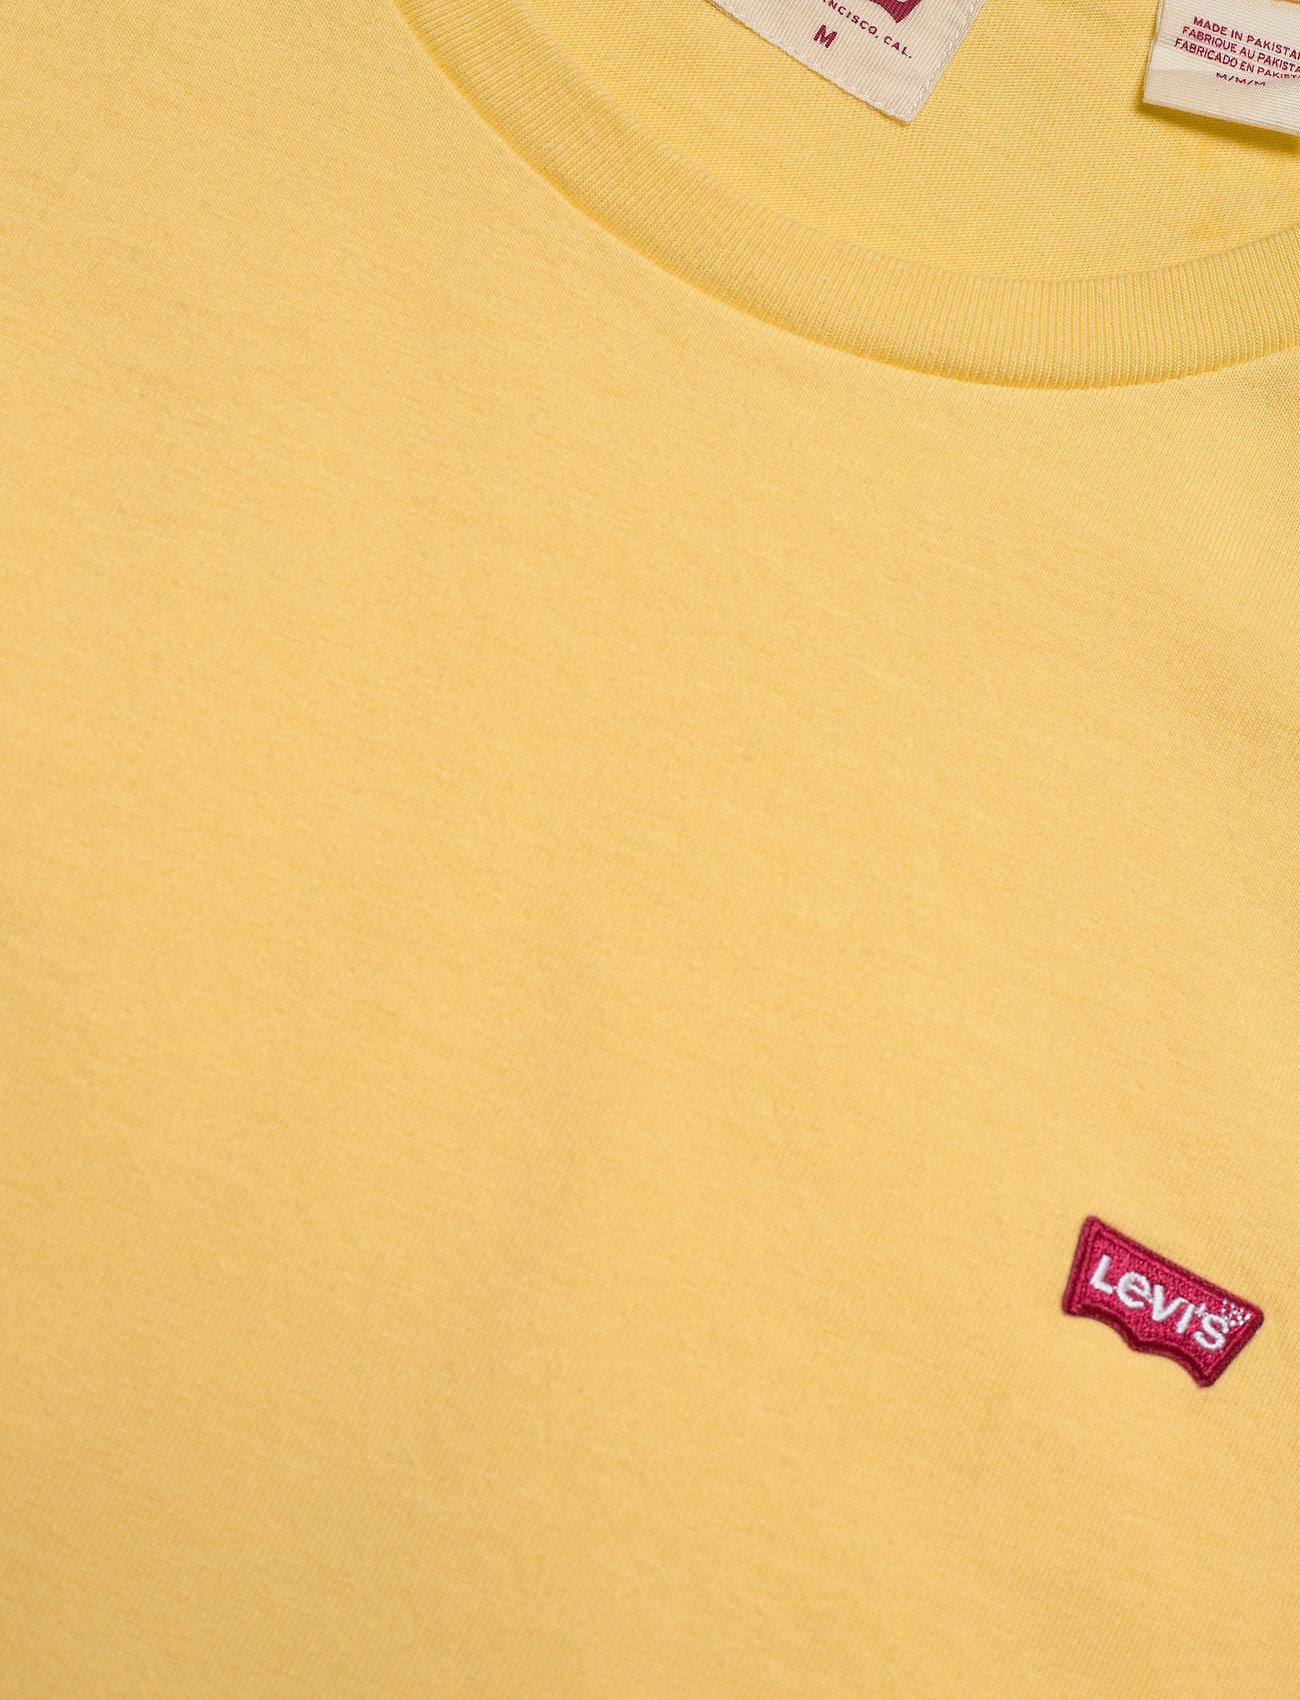 Ss Original Hm Tee Dusky Citro (Yellows/oranges) (249 kr) - LEVI´S Men